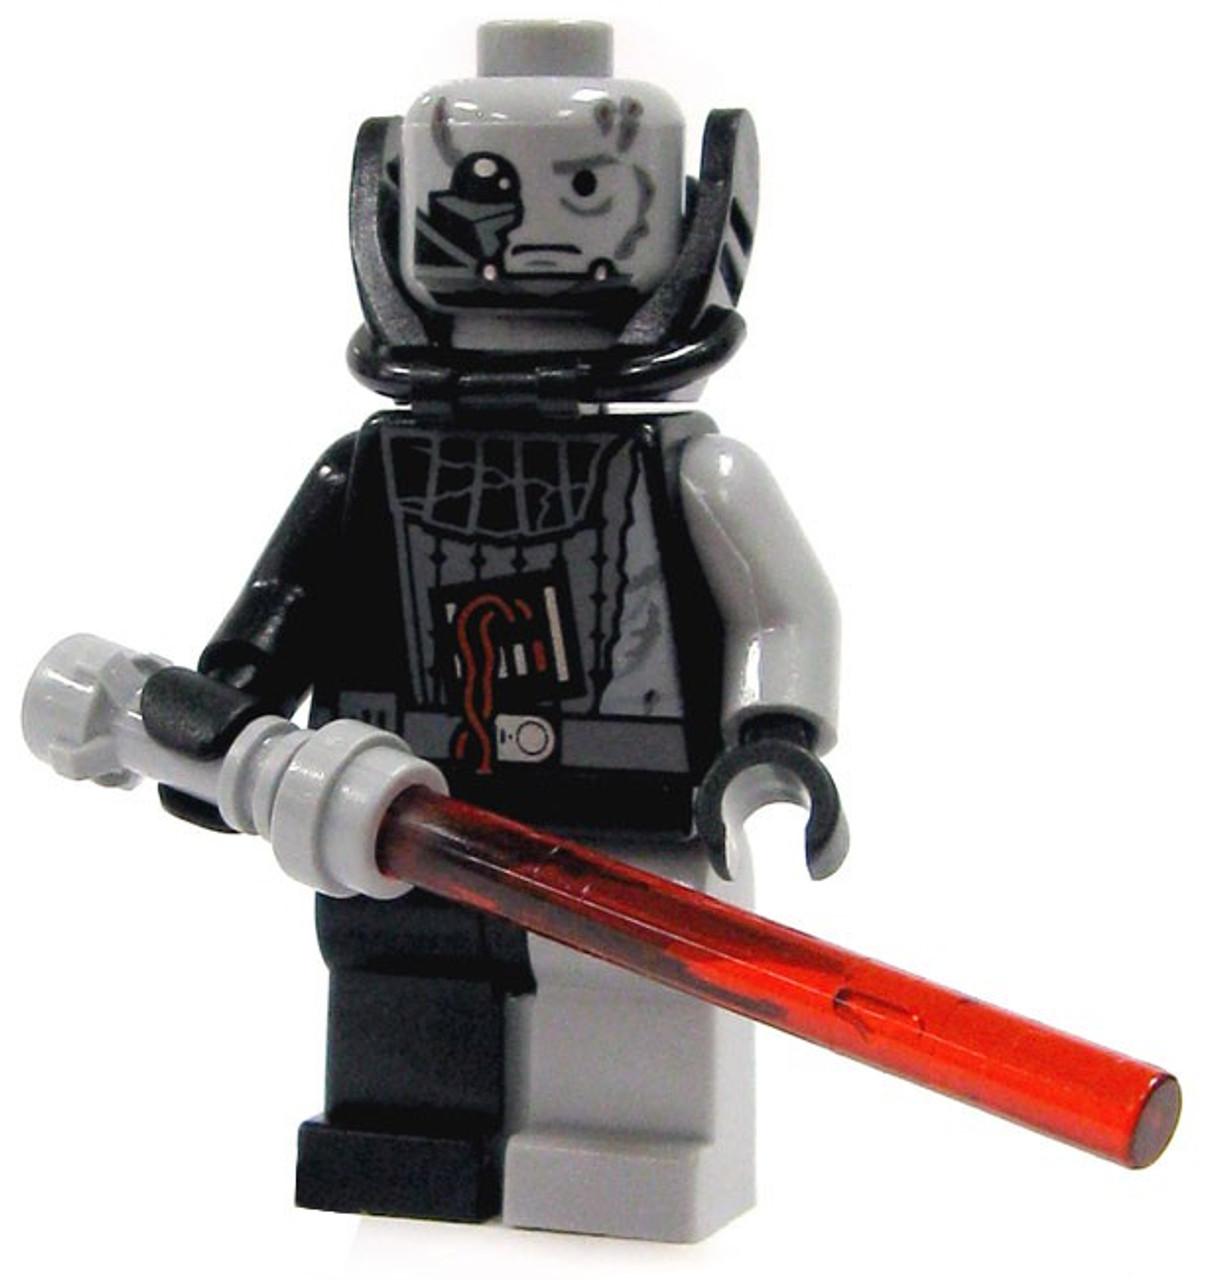 lego wars battle damaged darth vader minifigure toywiz